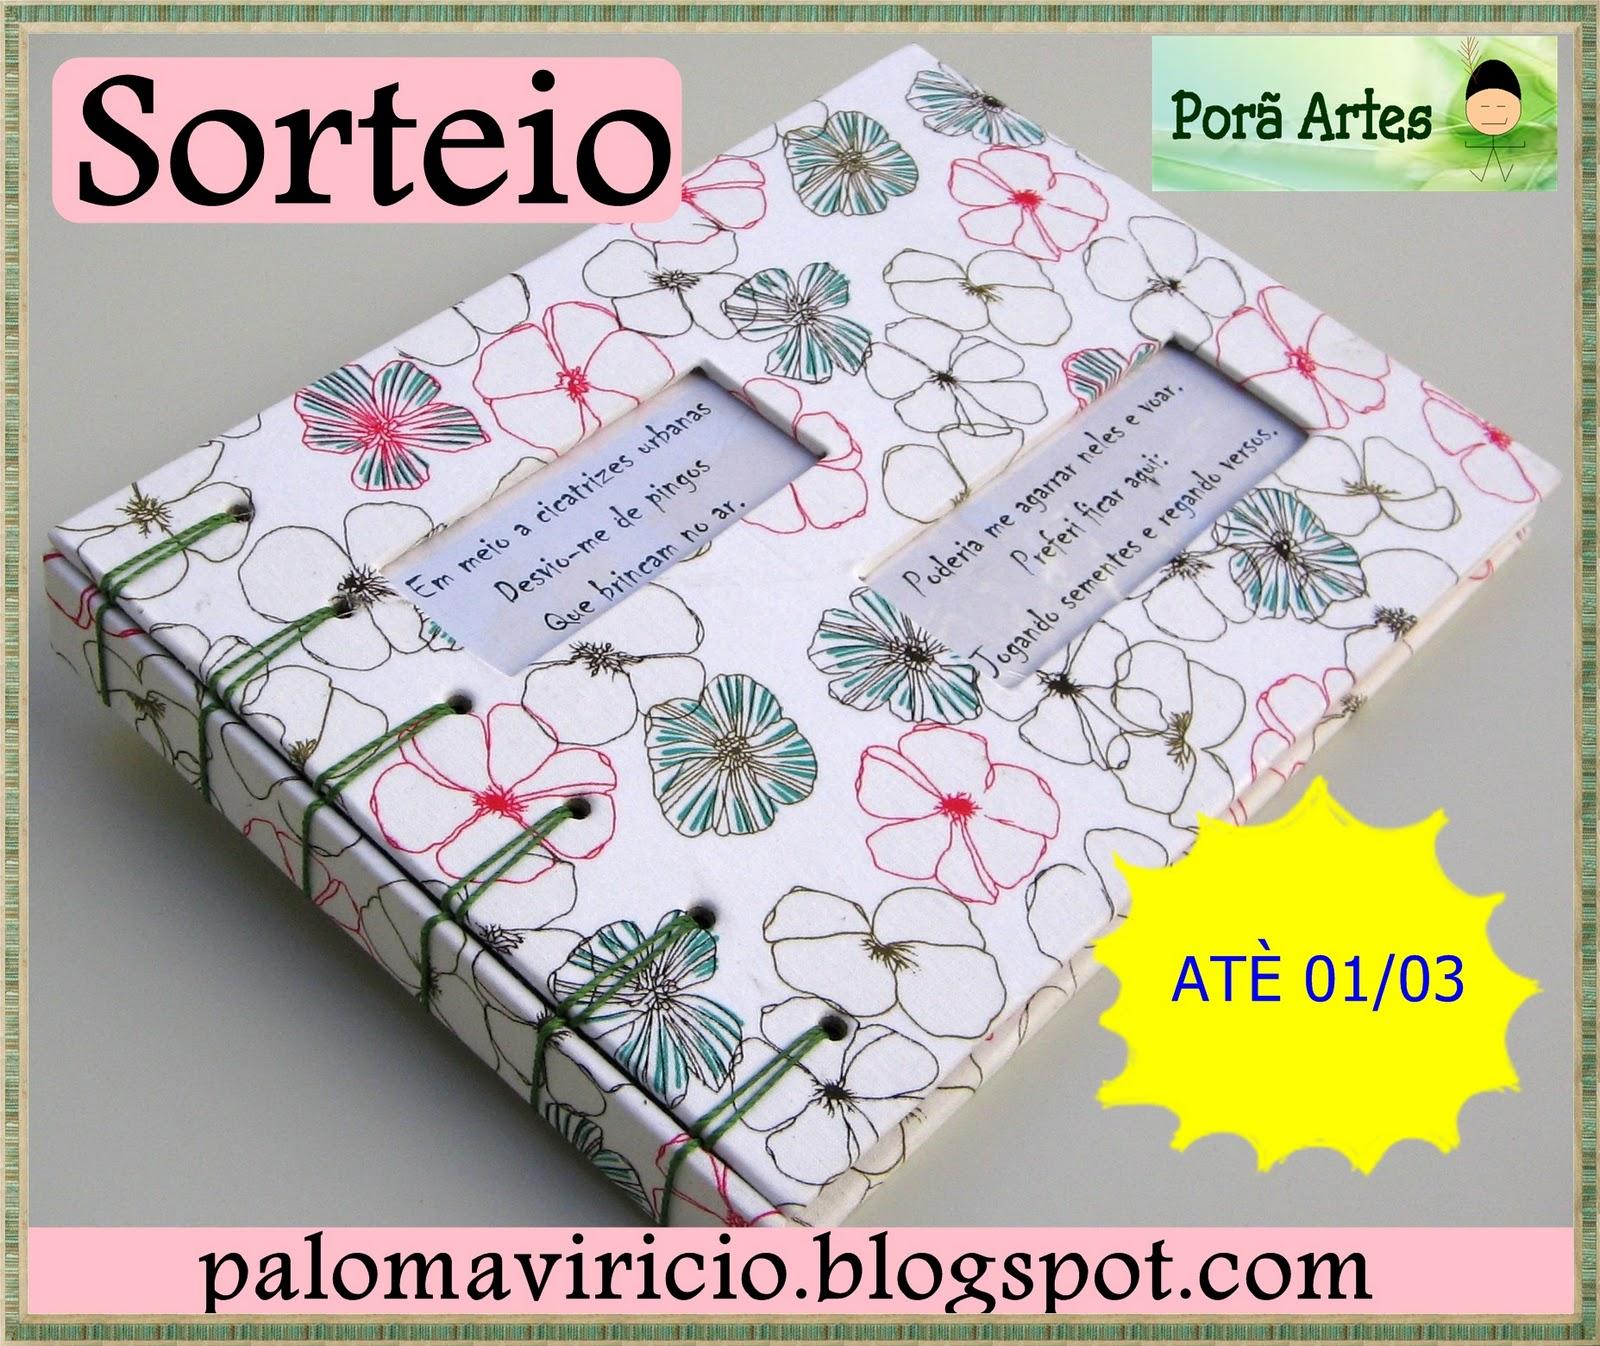 Sorteio Jornalismo na Alma + Projeto Poema-Porã Artes